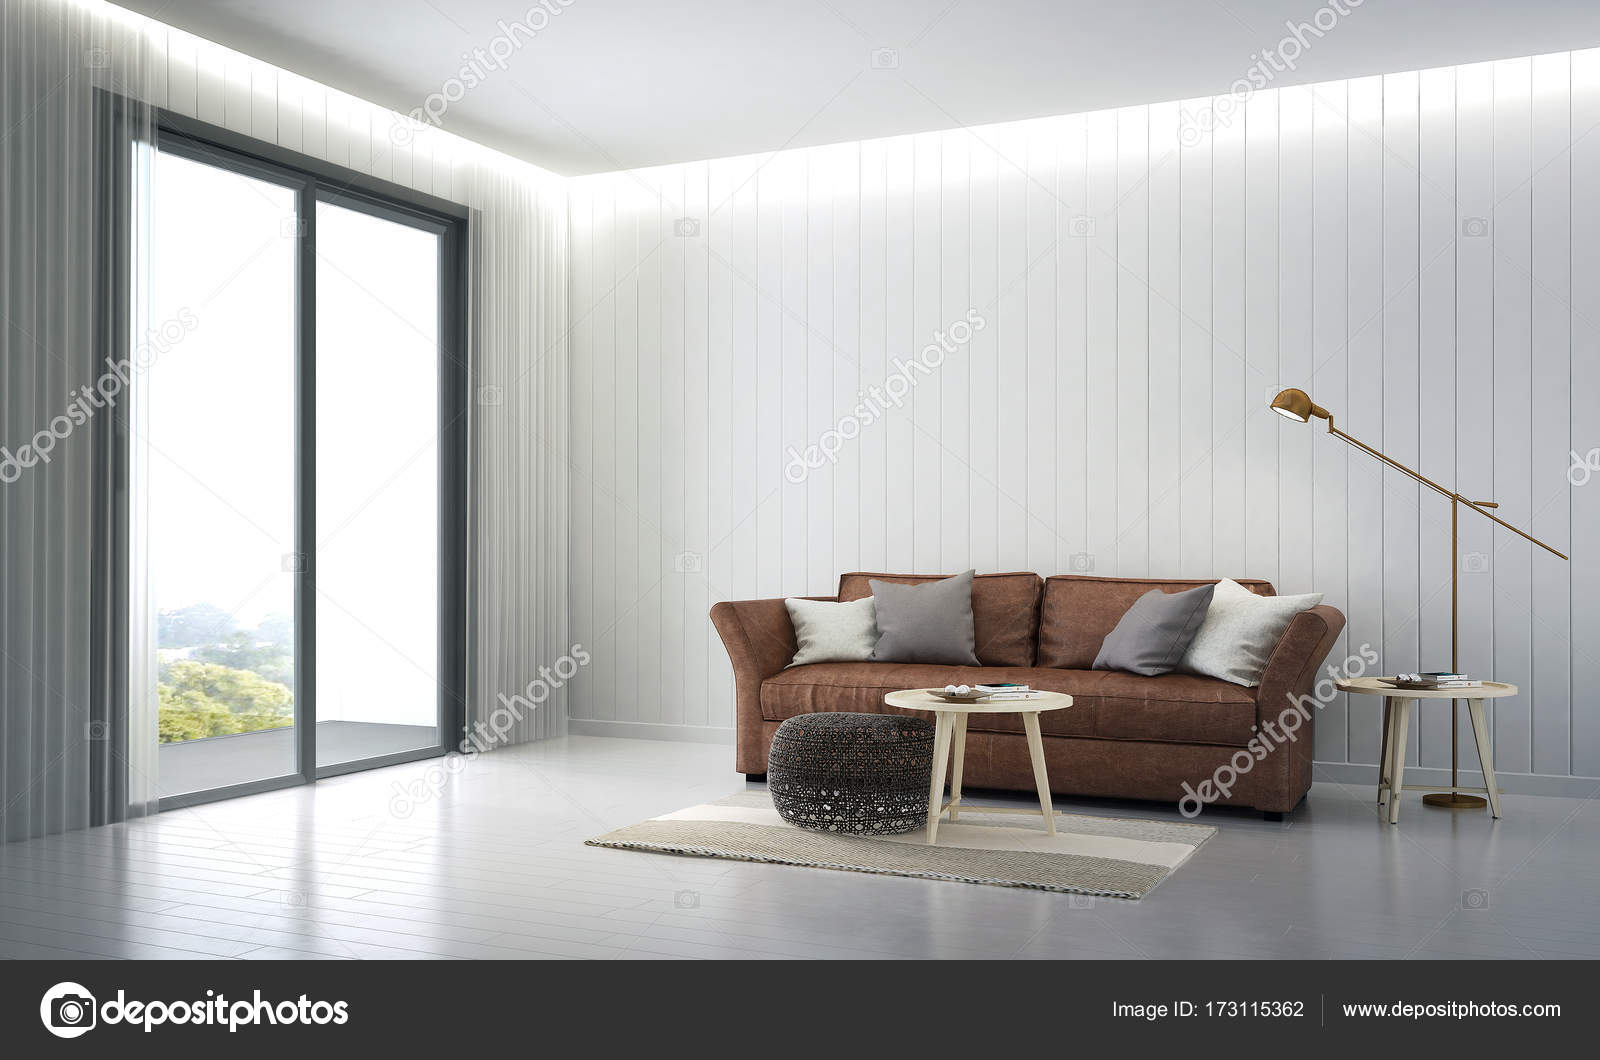 De lounge en woonkamer interieur en hout muur patroon — Stockfoto ...